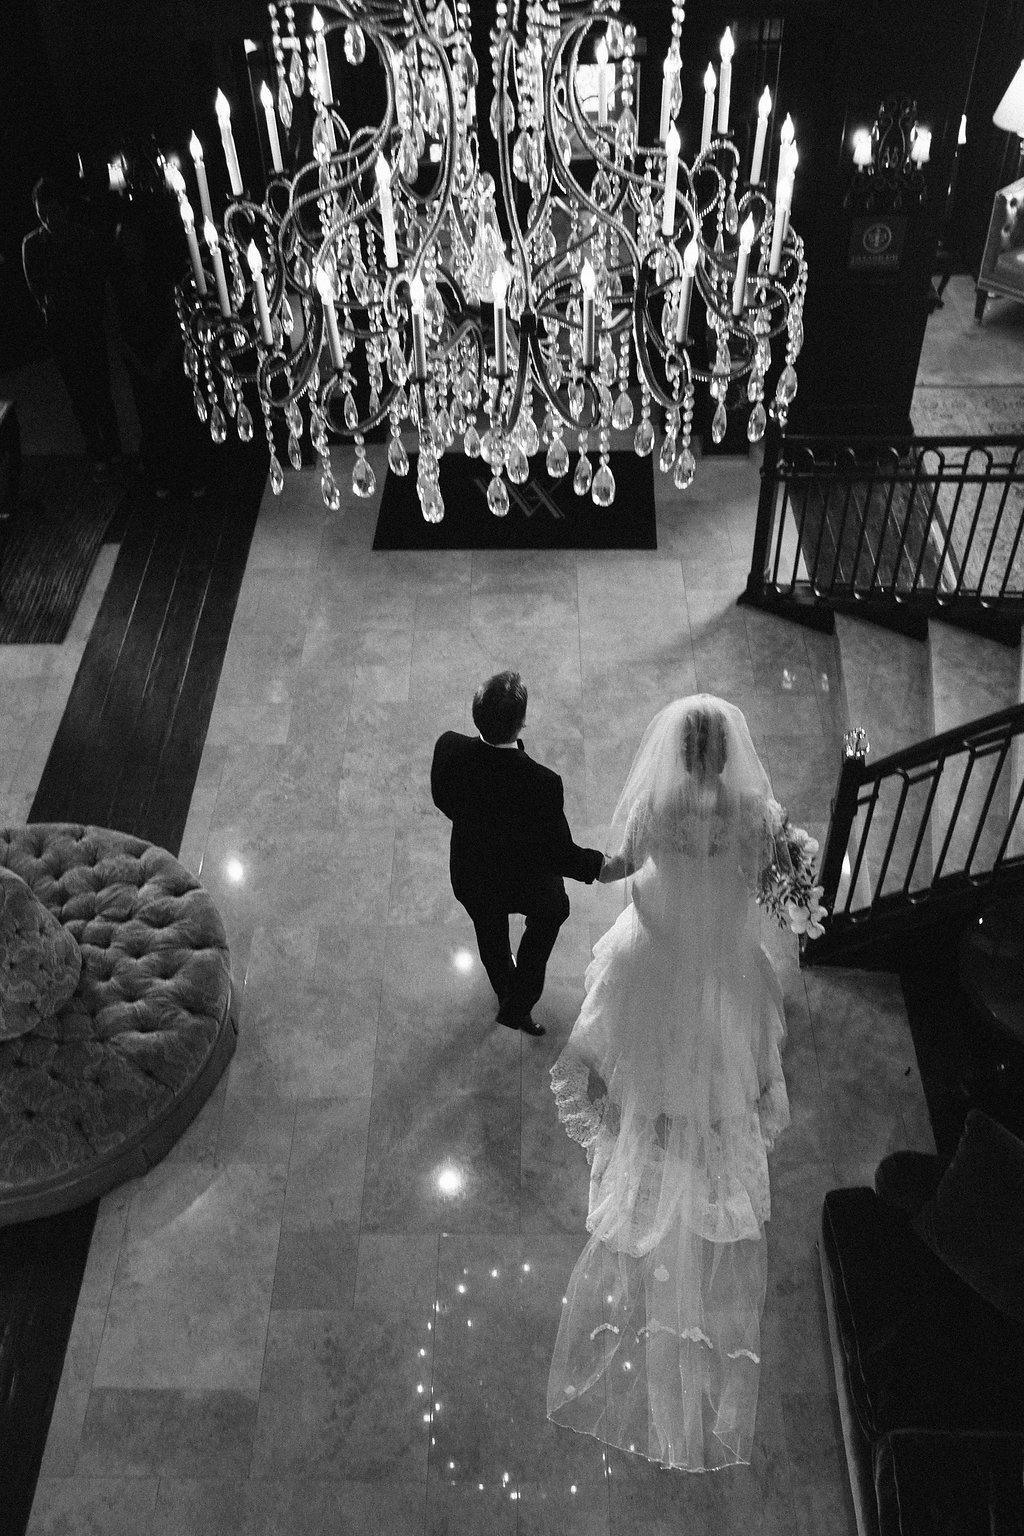 waldorf-astoria-wedding-photography-15.jpg